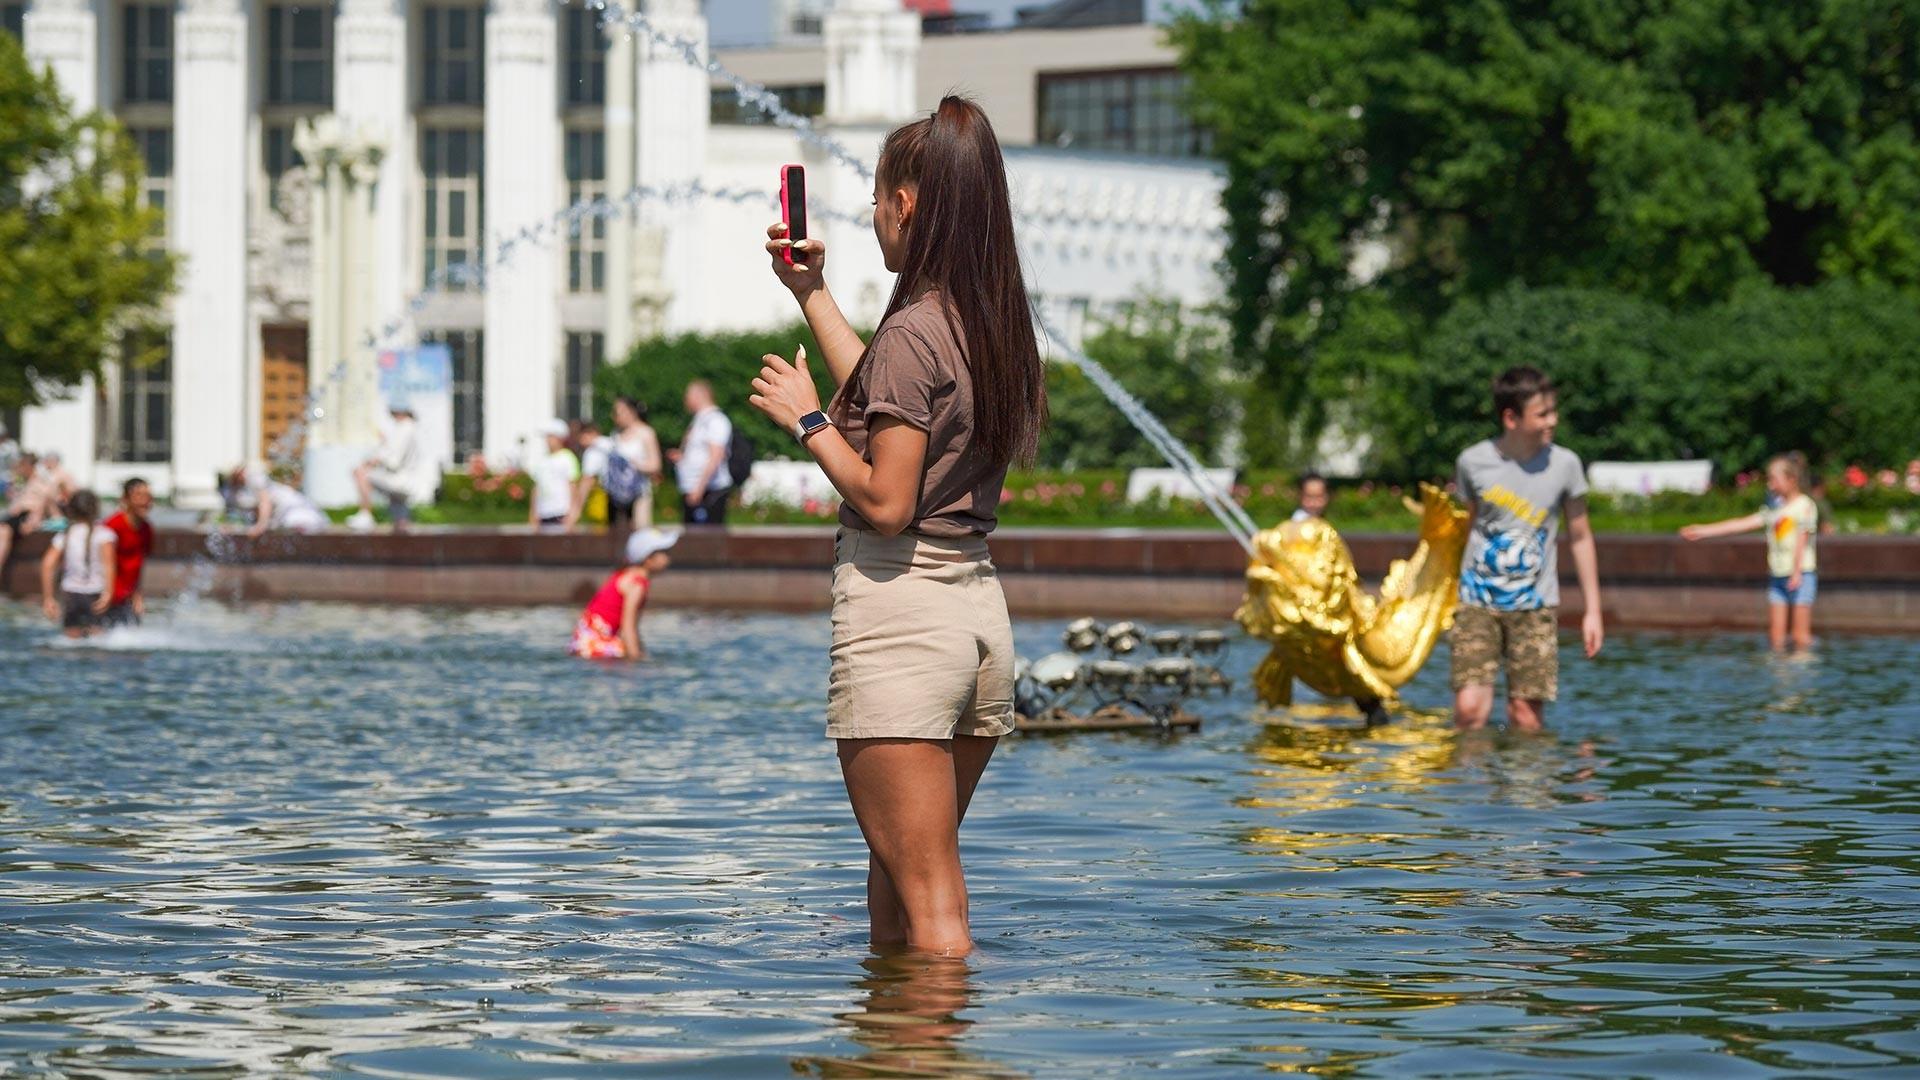 VDNKh, Moskow, 22 Juni 2021